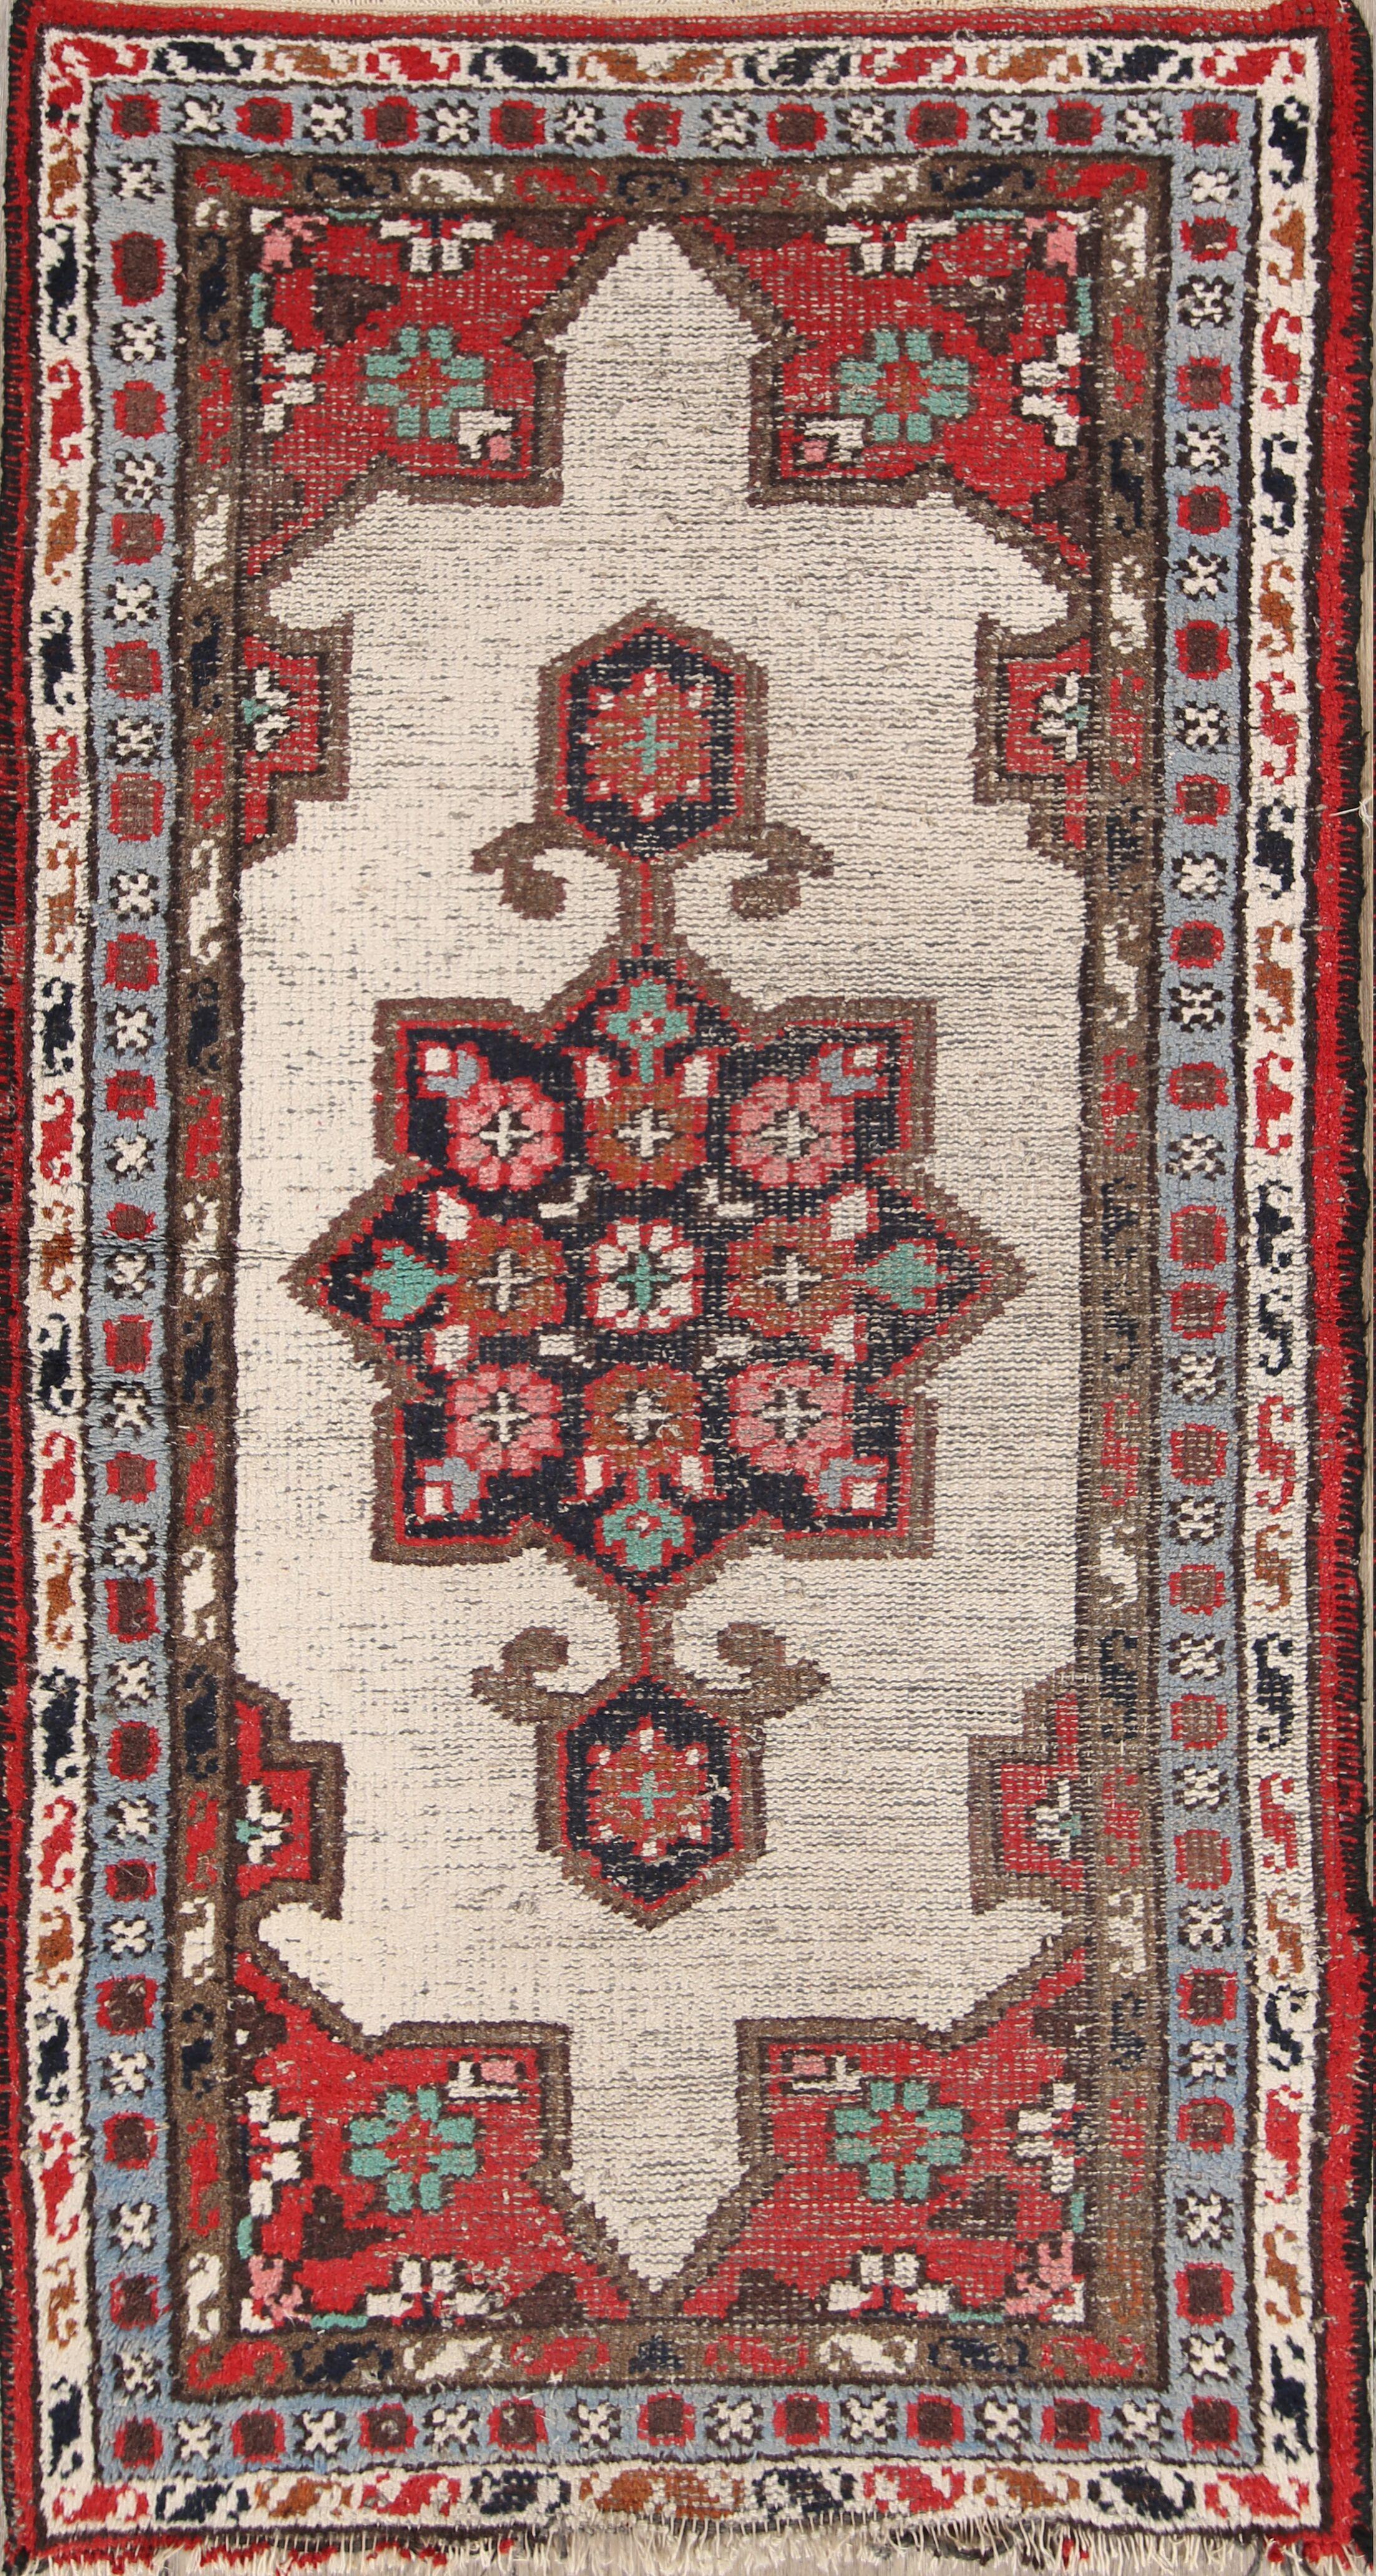 Needham Heriz Oriental Hand-Knotted Wool Beige/Red Area Rug